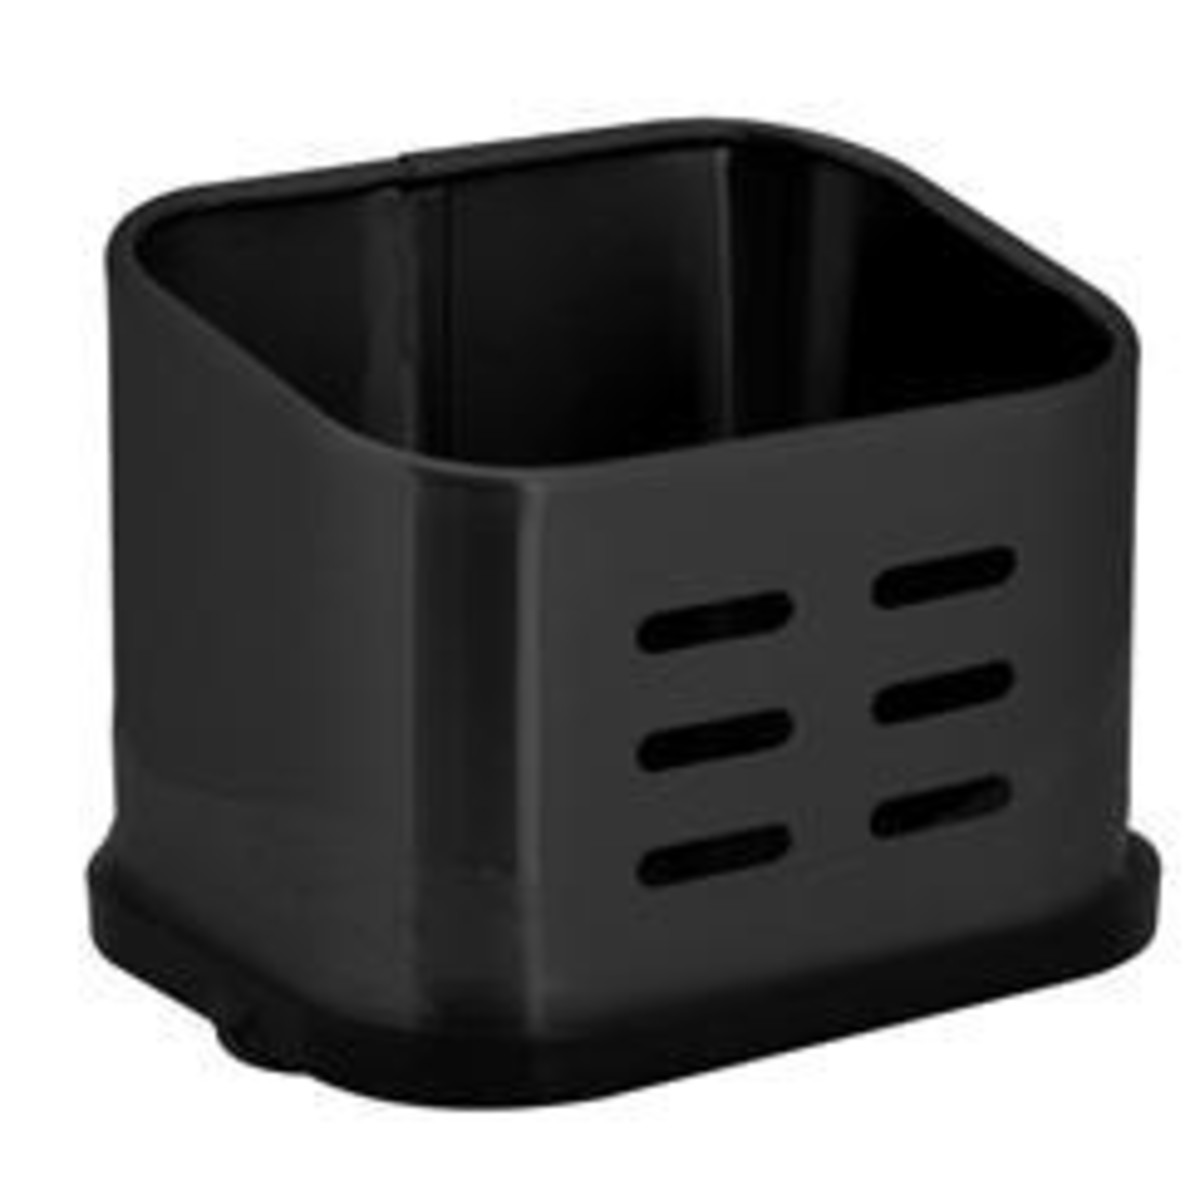 Подставка для губки 11.5х8.5х8.5 см цвет черный